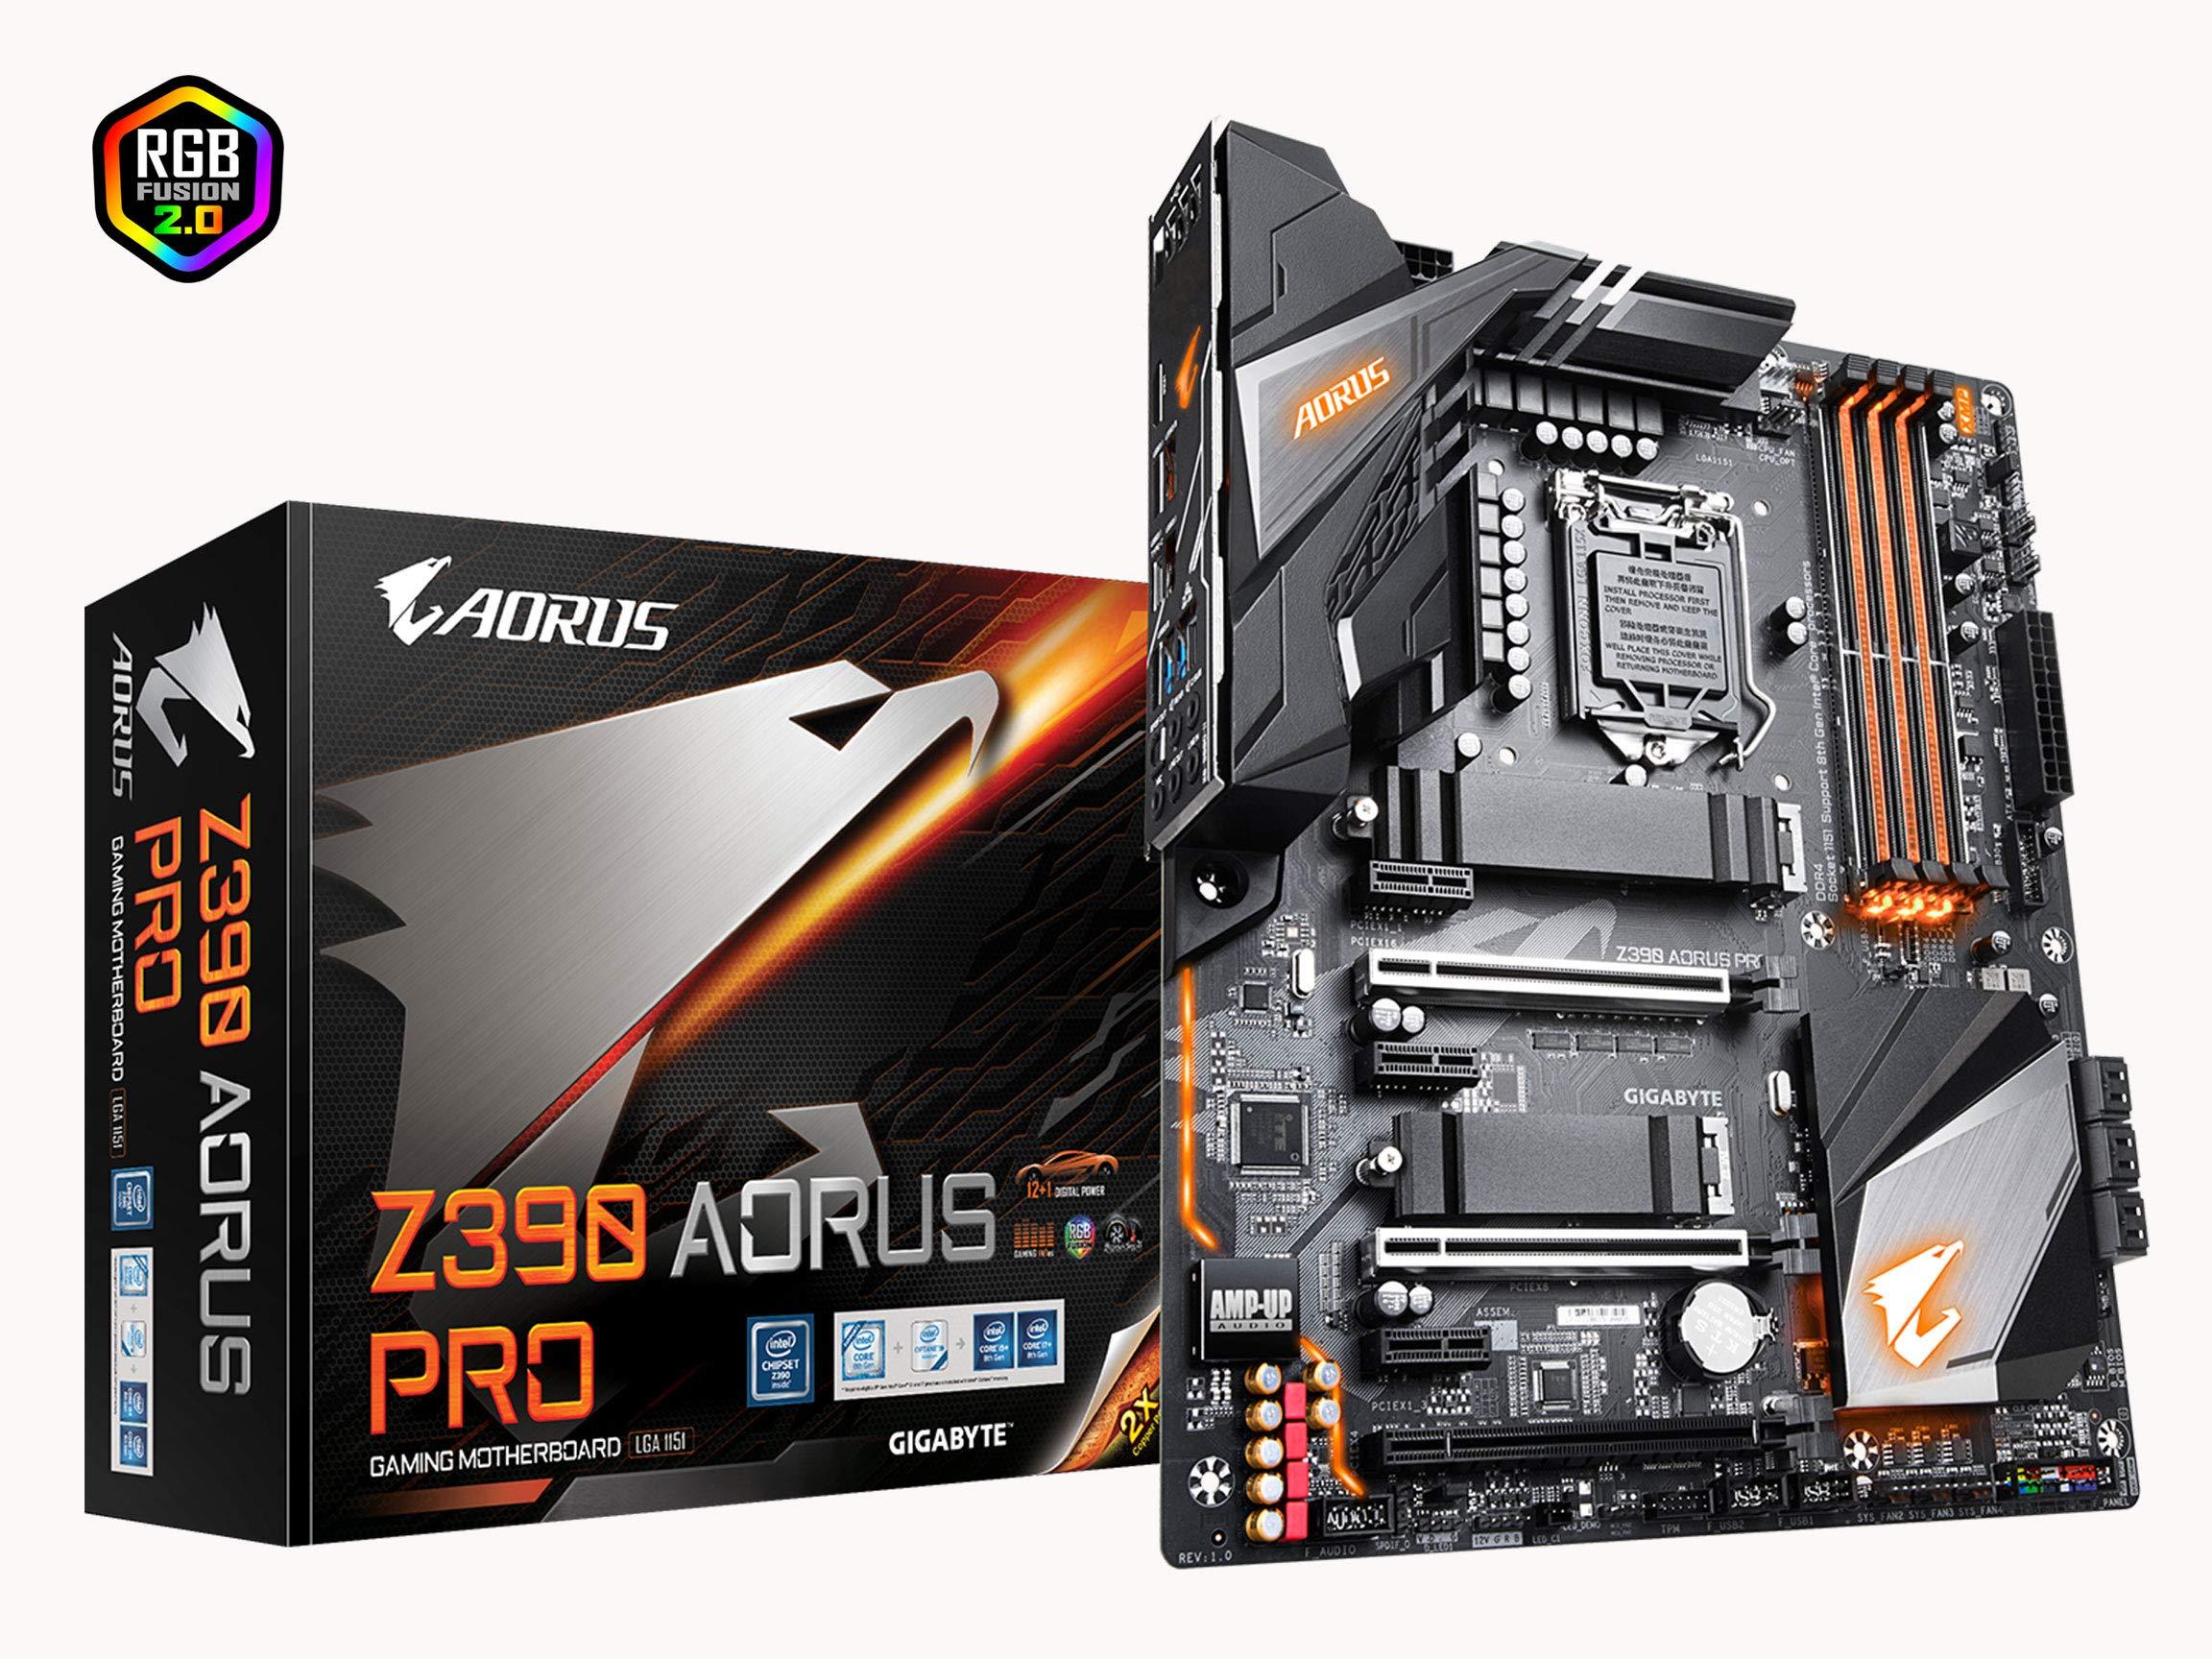 Gigabyte Z390 AORUS PRO (Intel LGA1151/Z390/ATX/2xM.2 The...